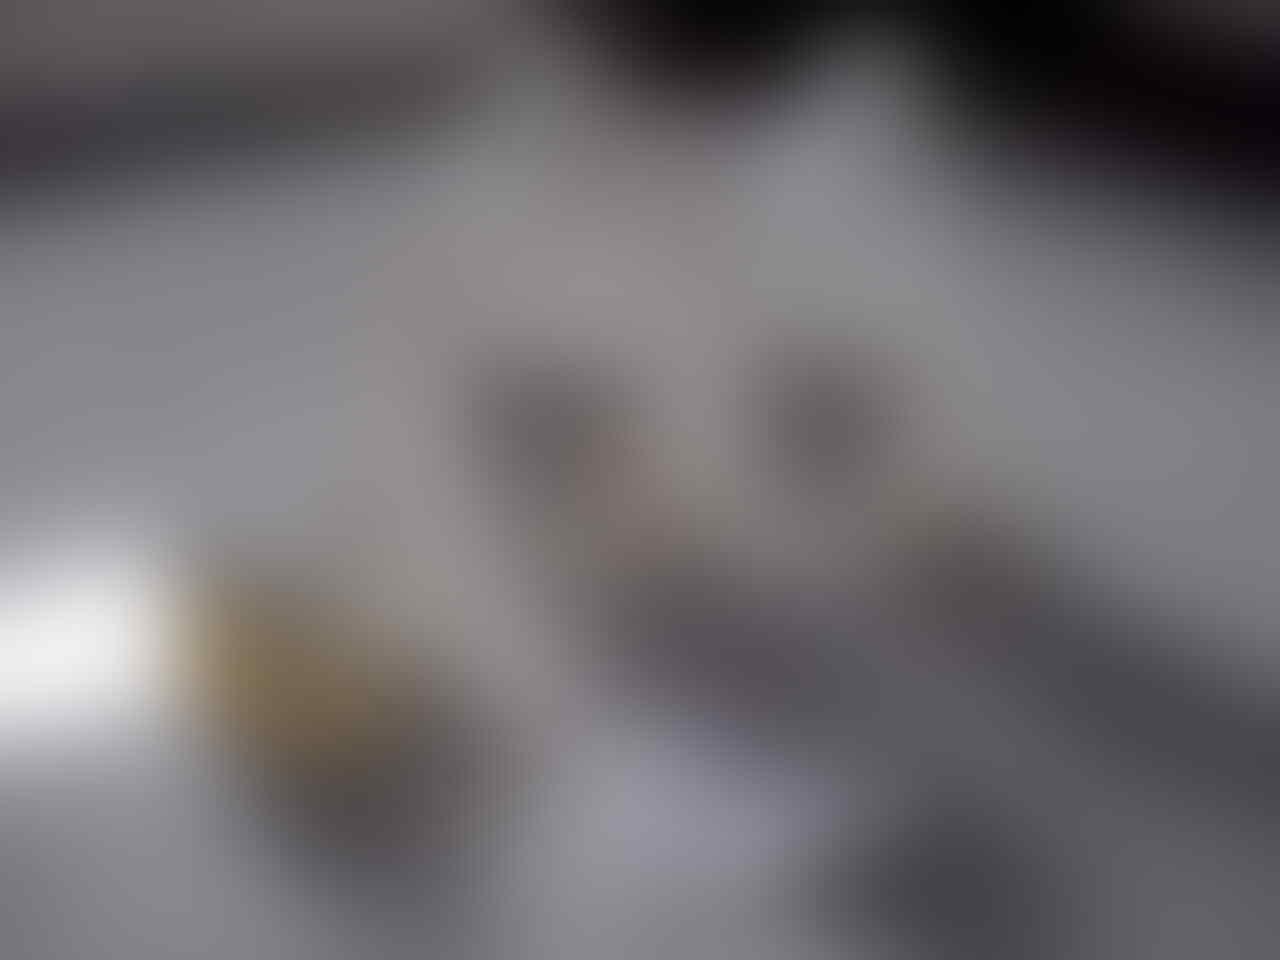 Konsentrat / Consentrate DIY e Juice E Liquid Bandung